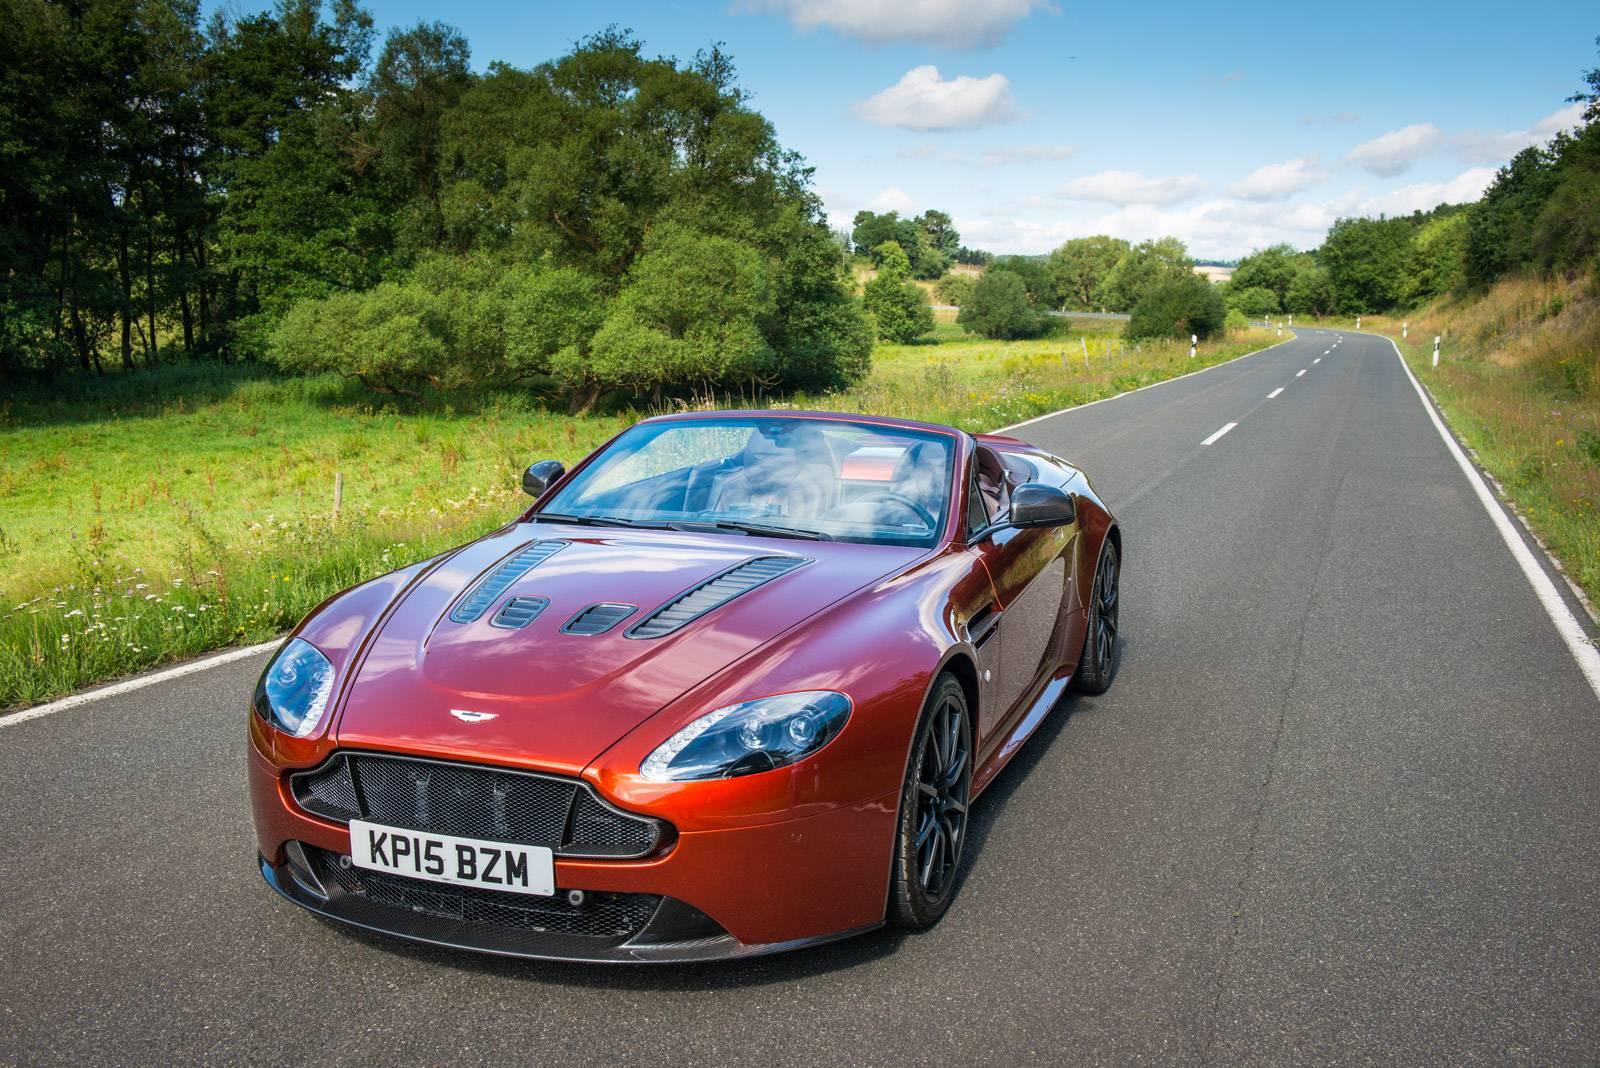 Aston Martin V Vantage S Roadster Review GTspirit - Aston martin v12 vantage s price